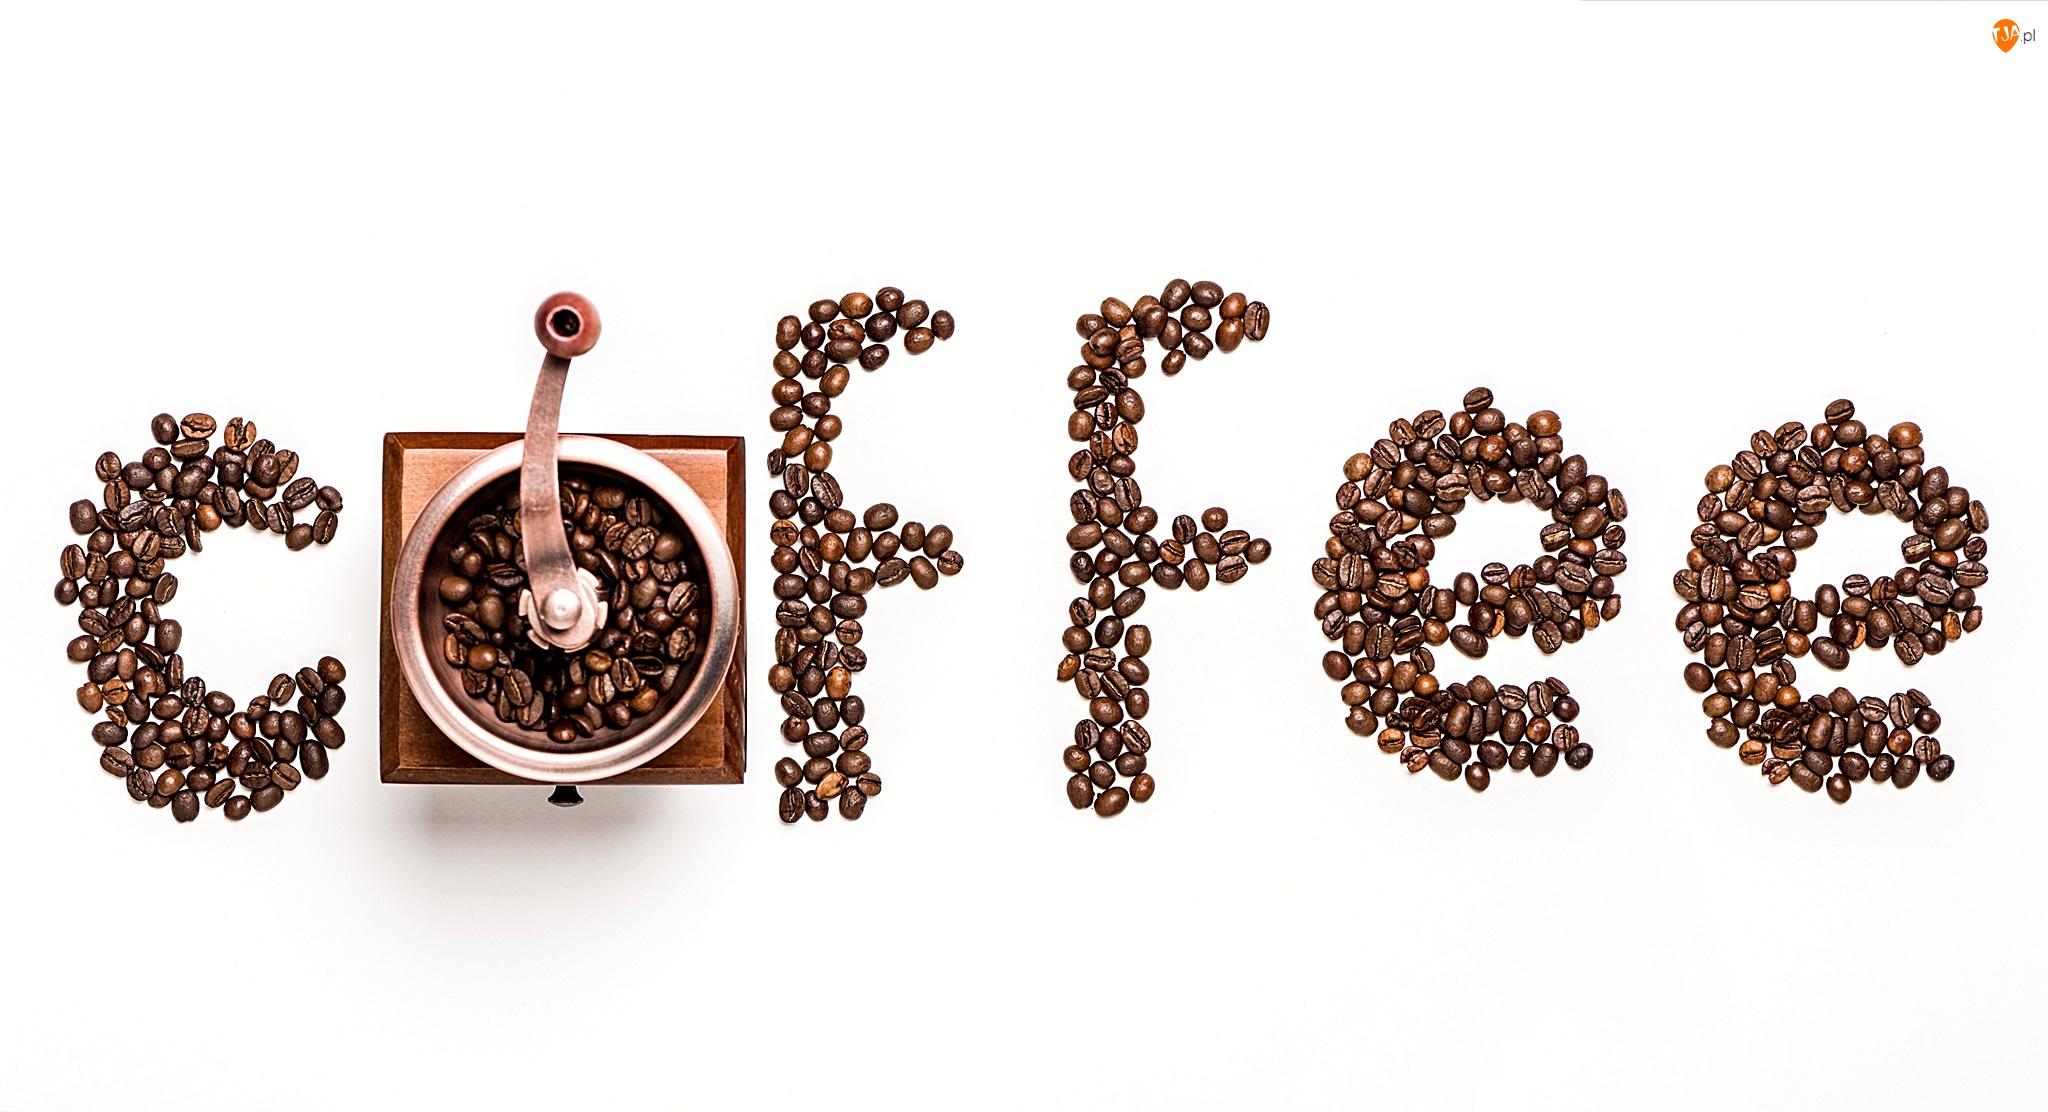 Kawa, Napis, Ziarna, Młynek